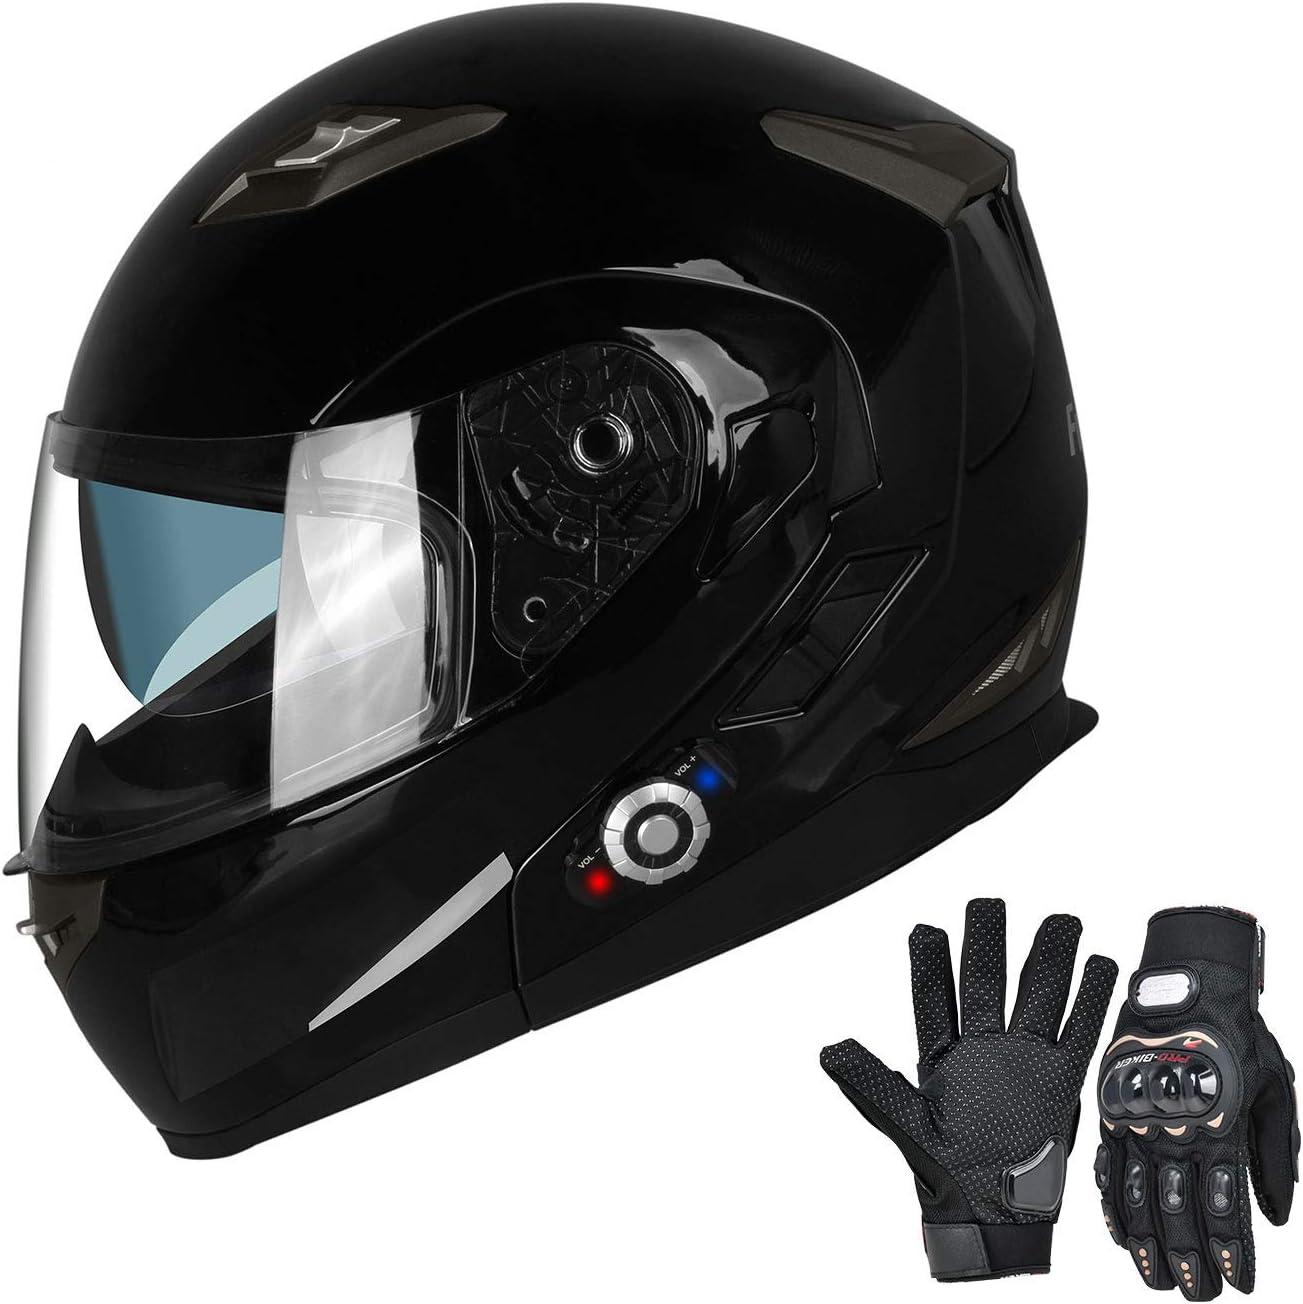 DOT Approved Helmet FreedConn Motorcycle Bluetooth Helmets Built-in Mp3 FM Radio Integrated Intercom Communication System Modular Flip up Dual Visors Full Face Helmets